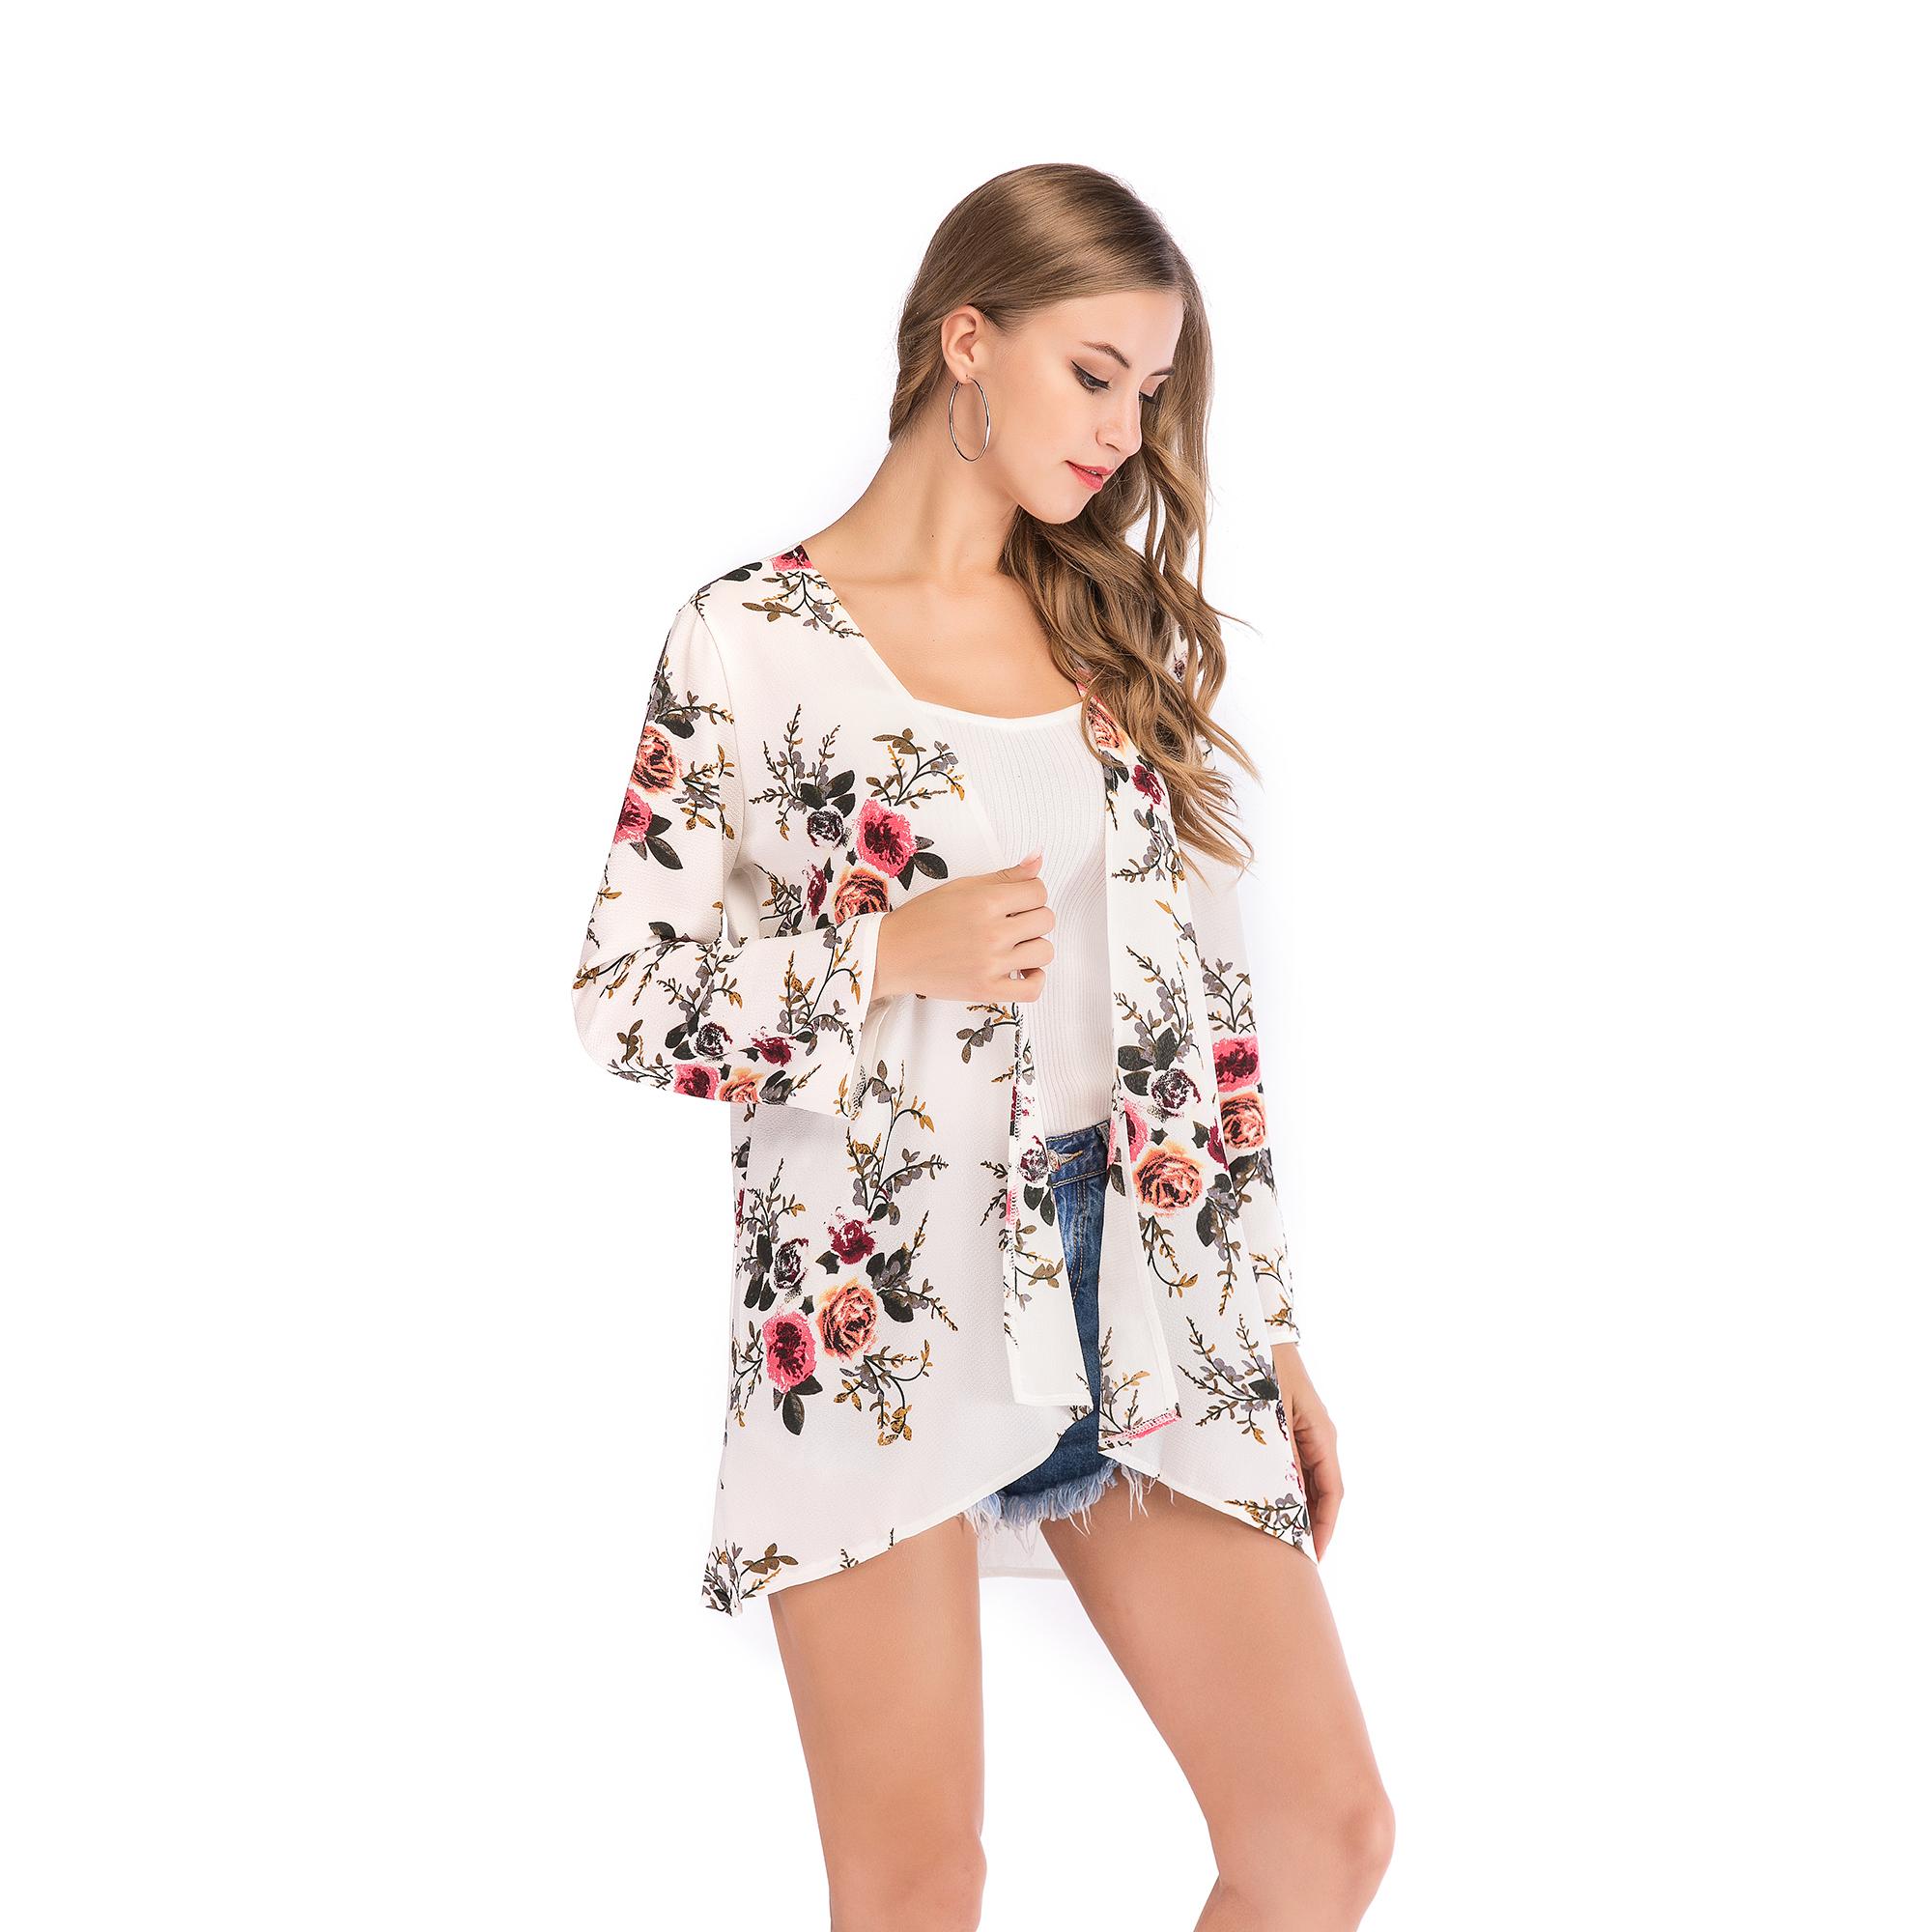 Fashion-Women-Loose-Blouse-Kimono-Cardigan-Tops-Summer-Bikini-Cover-Up-Wrap-Coat thumbnail 32